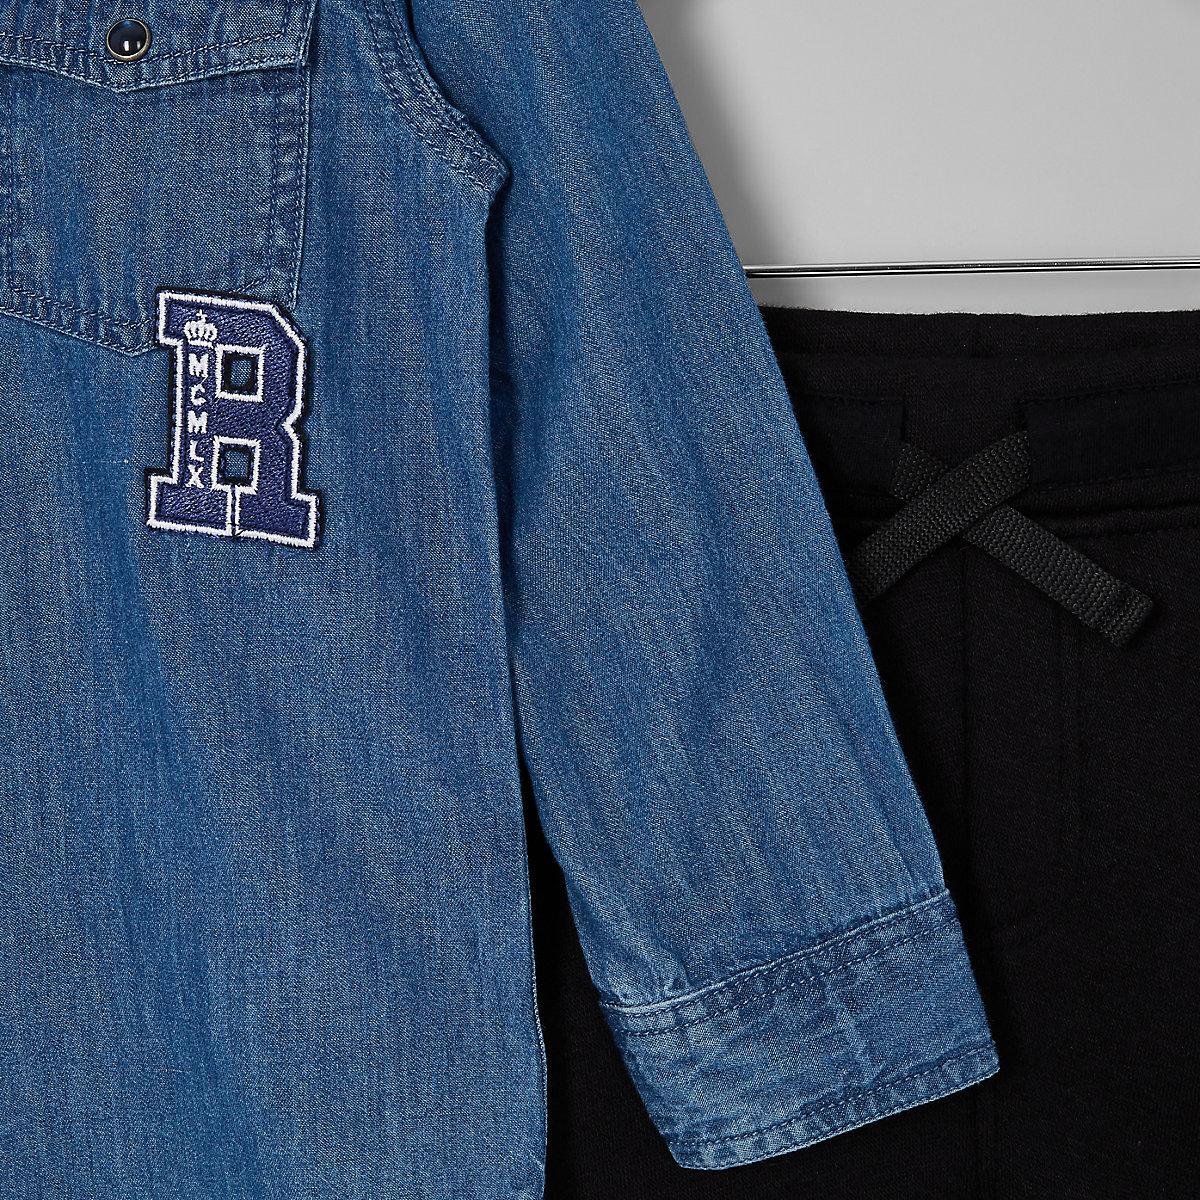 da5f0b501 Mini boys blue denim shirt and jogger outfit - Baby Boys Outfits ...